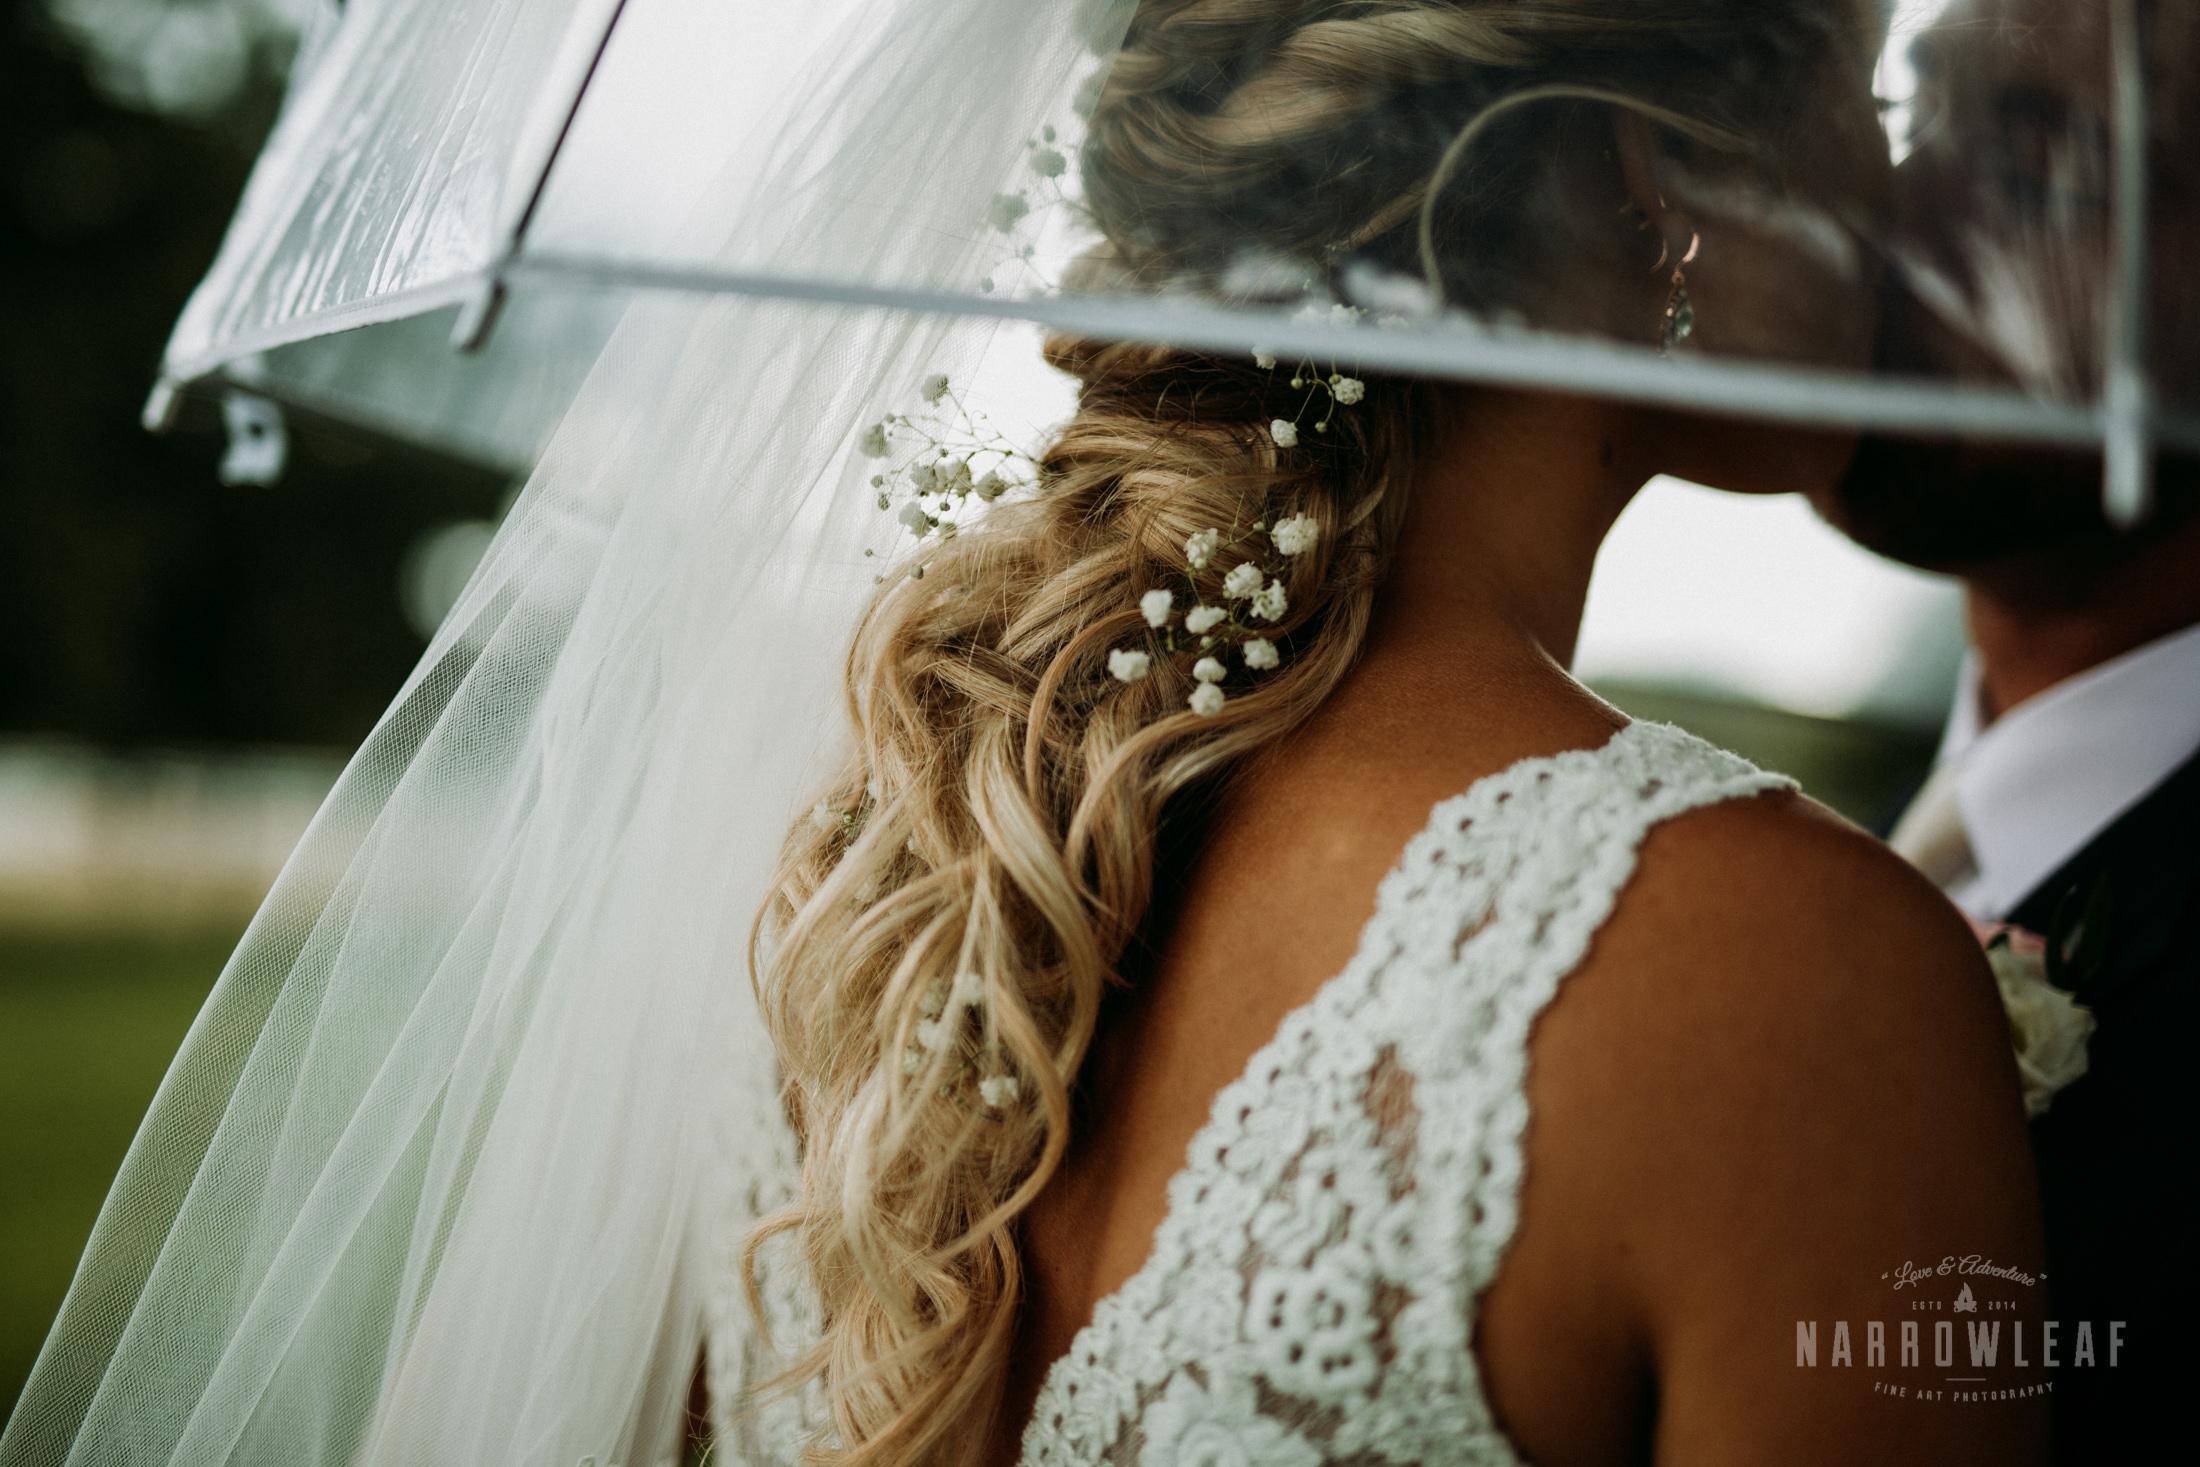 John-P-Furber-Farm-Minnesota-wedding-photographer-Narrowleaf_Love_and_Adventure_Photography-7272.jpg